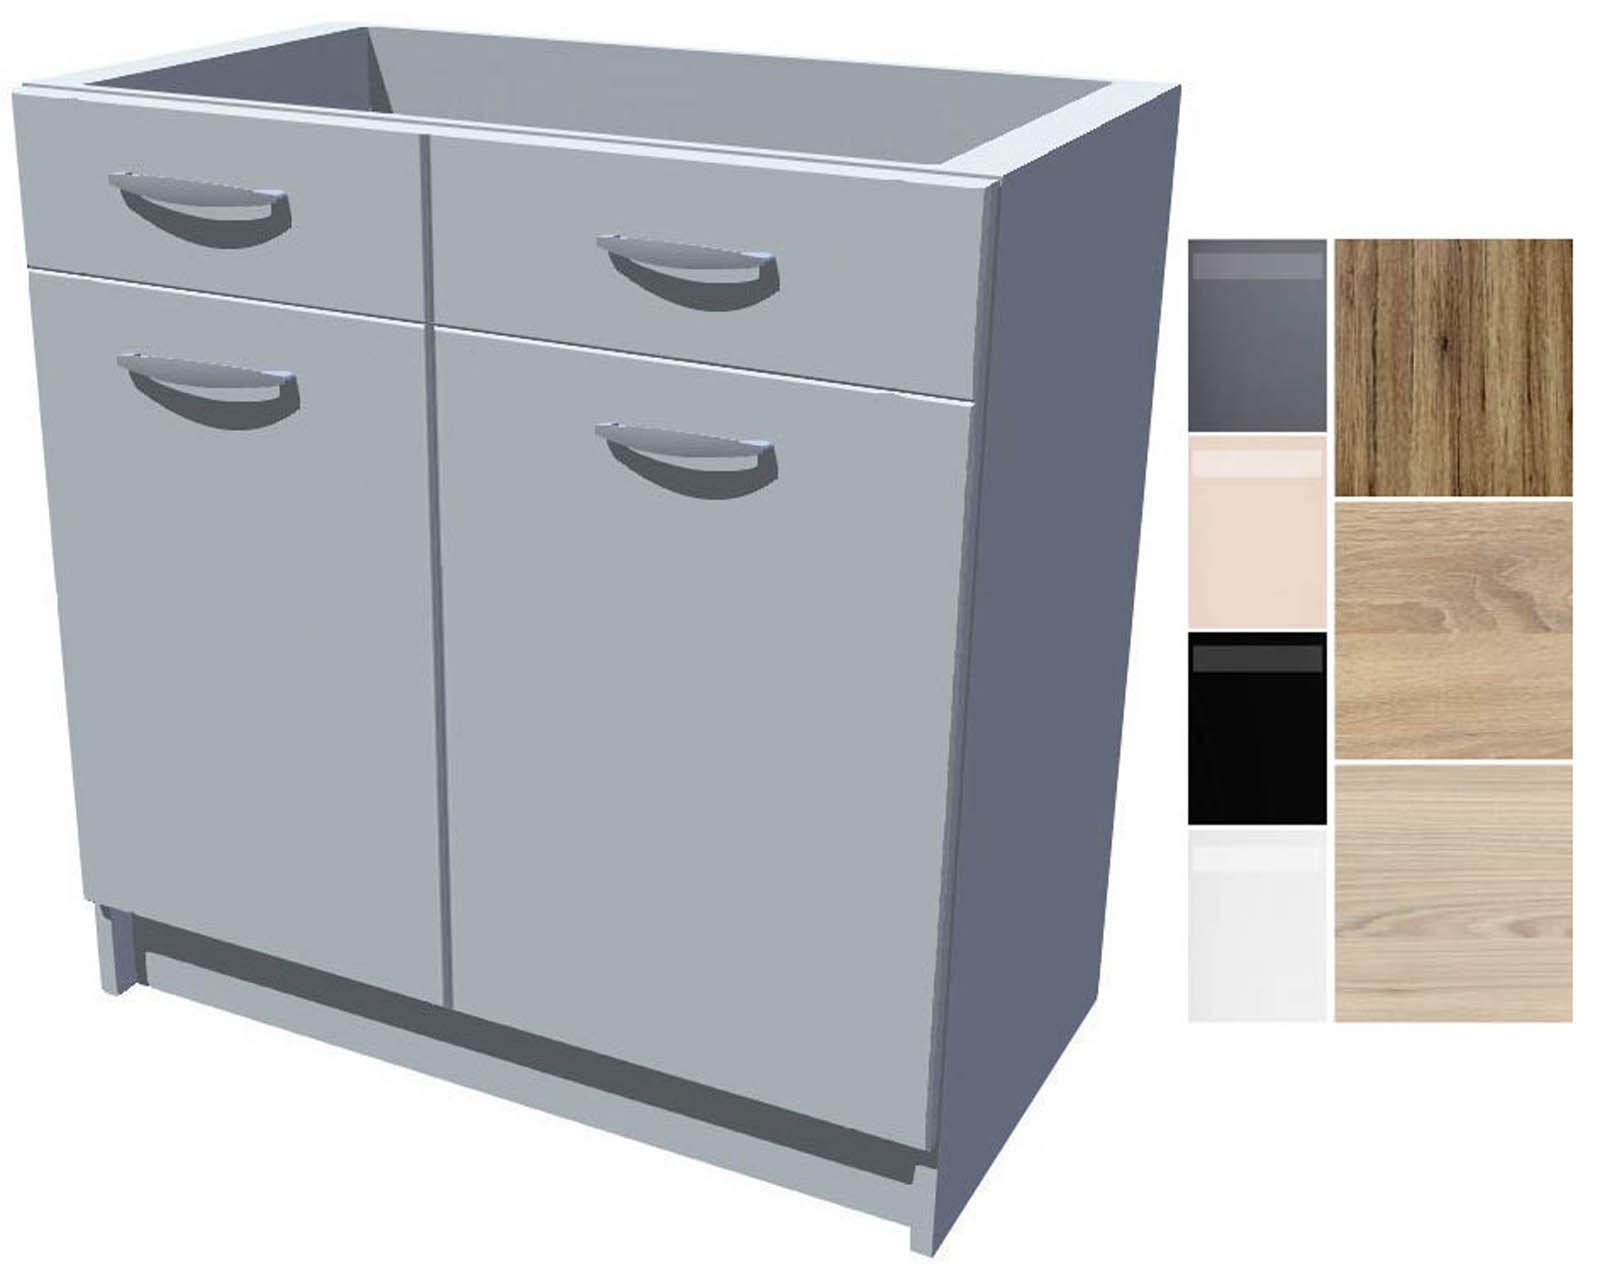 Dřezová kuchyňská skříňka Iga 2D 80 cm